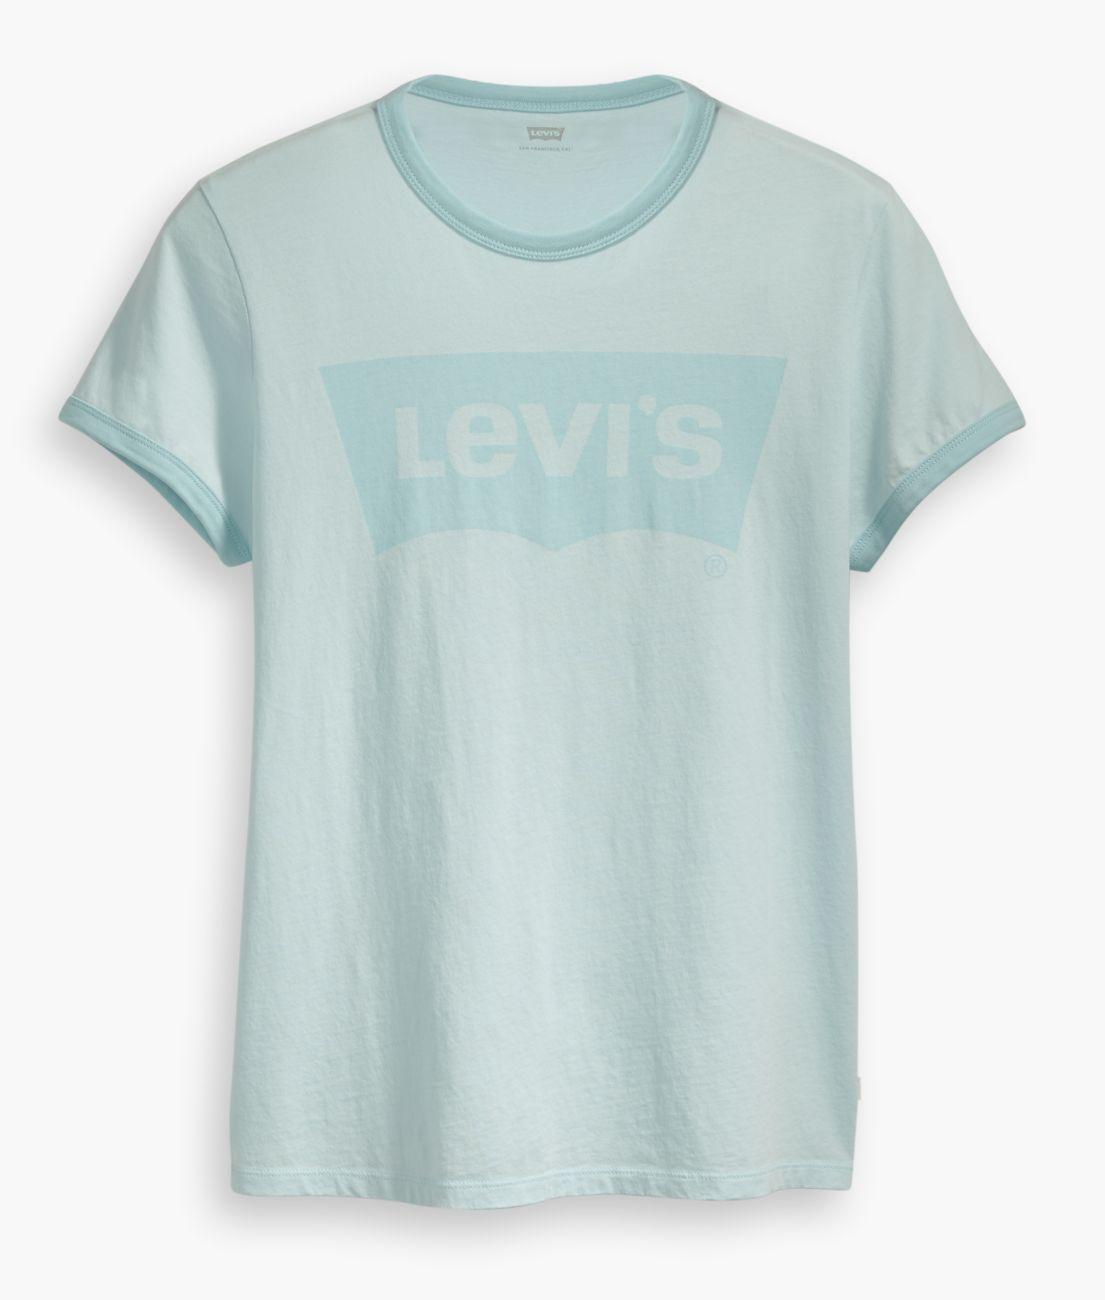 LEVIS Shirts f. Damen T-Shirt 35793-0008 mint W18-LDT1